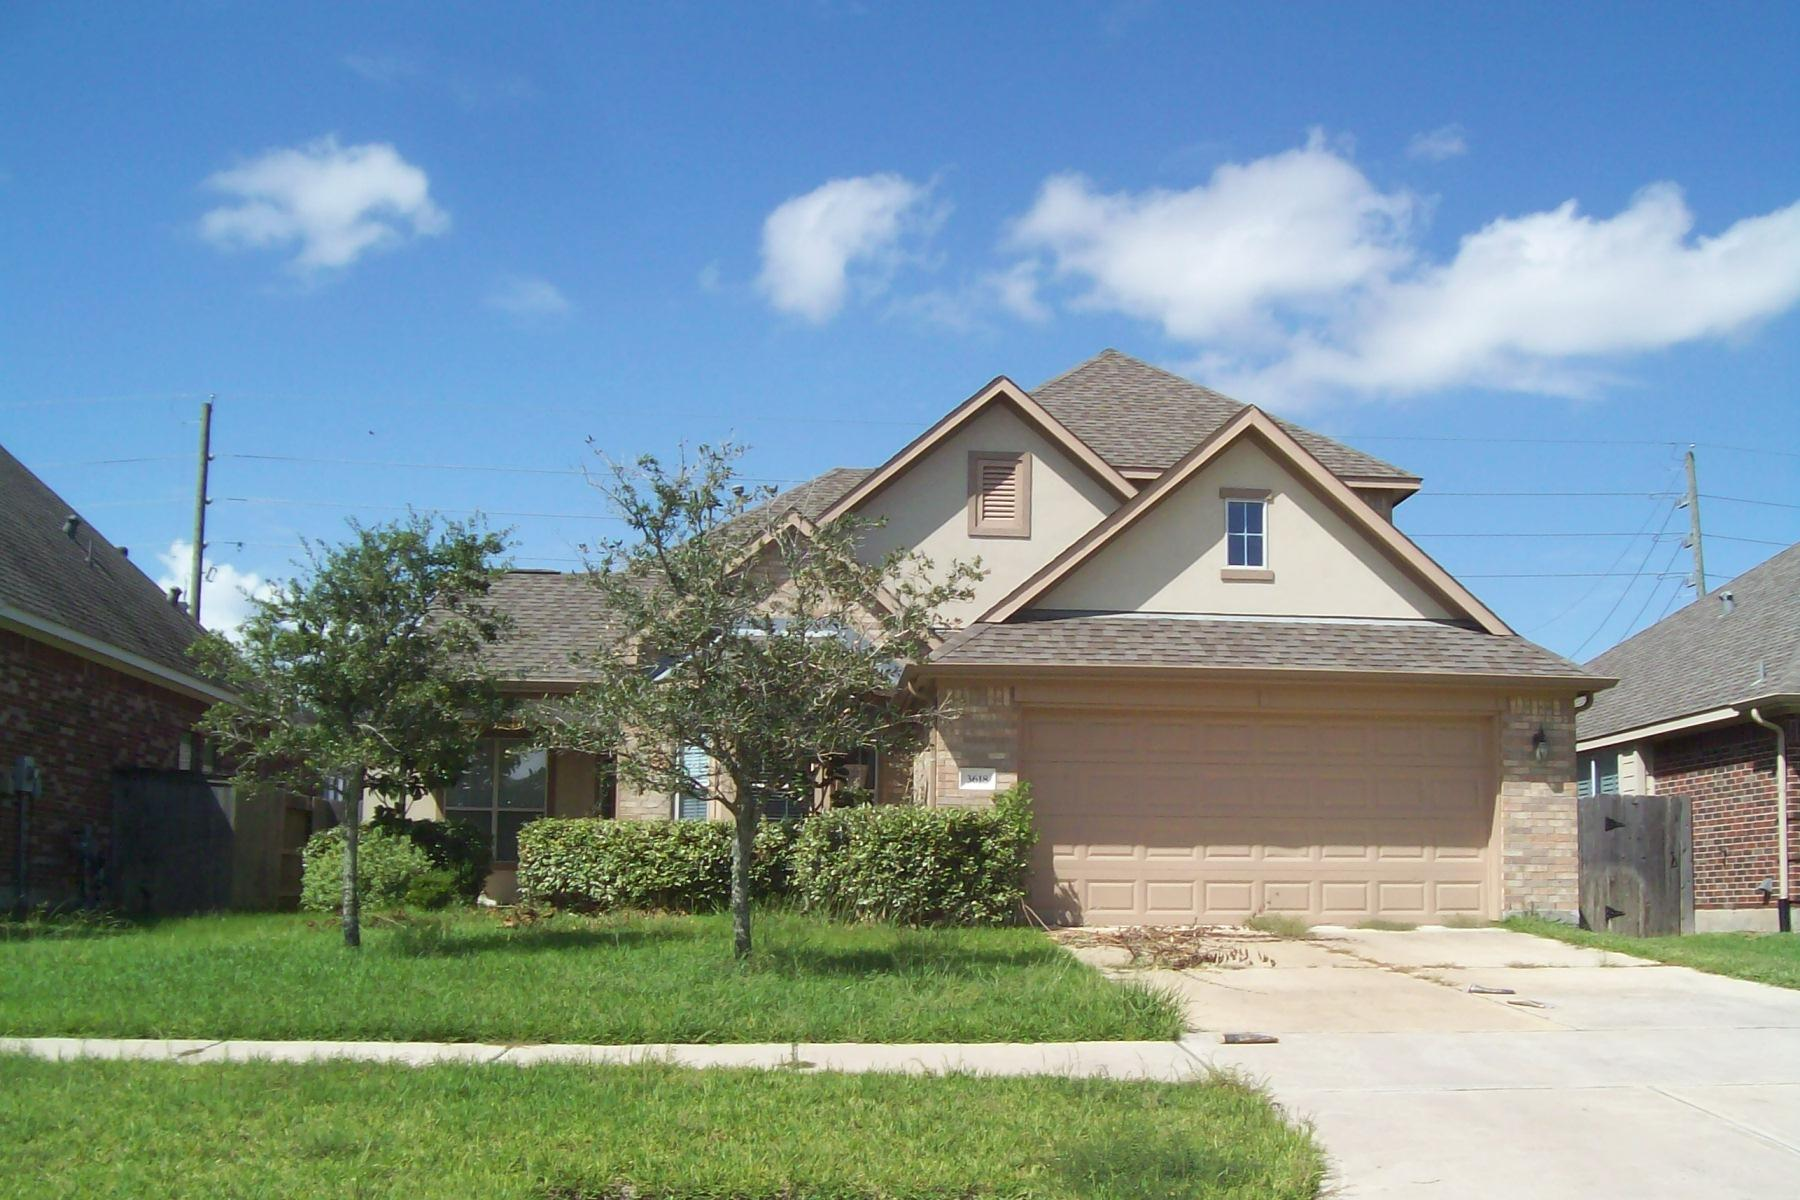 manvel texas cheap houses for sale manvel brazoria